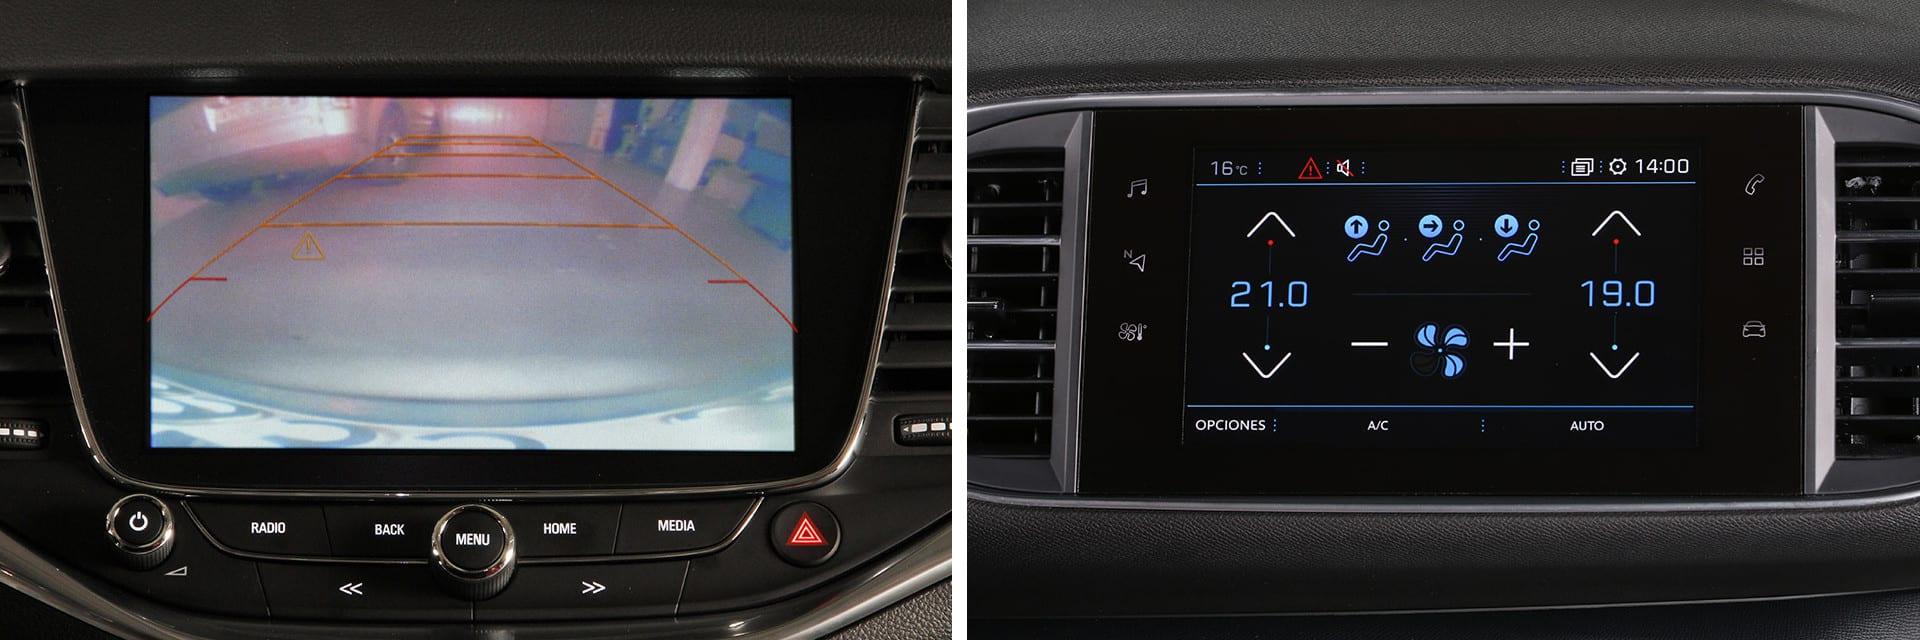 La pantalla del Opel Astra (izq.) es de 7 pulgadas mientras que la del Peugeot 308 (dcha.) es de 9,7 pulgadas.